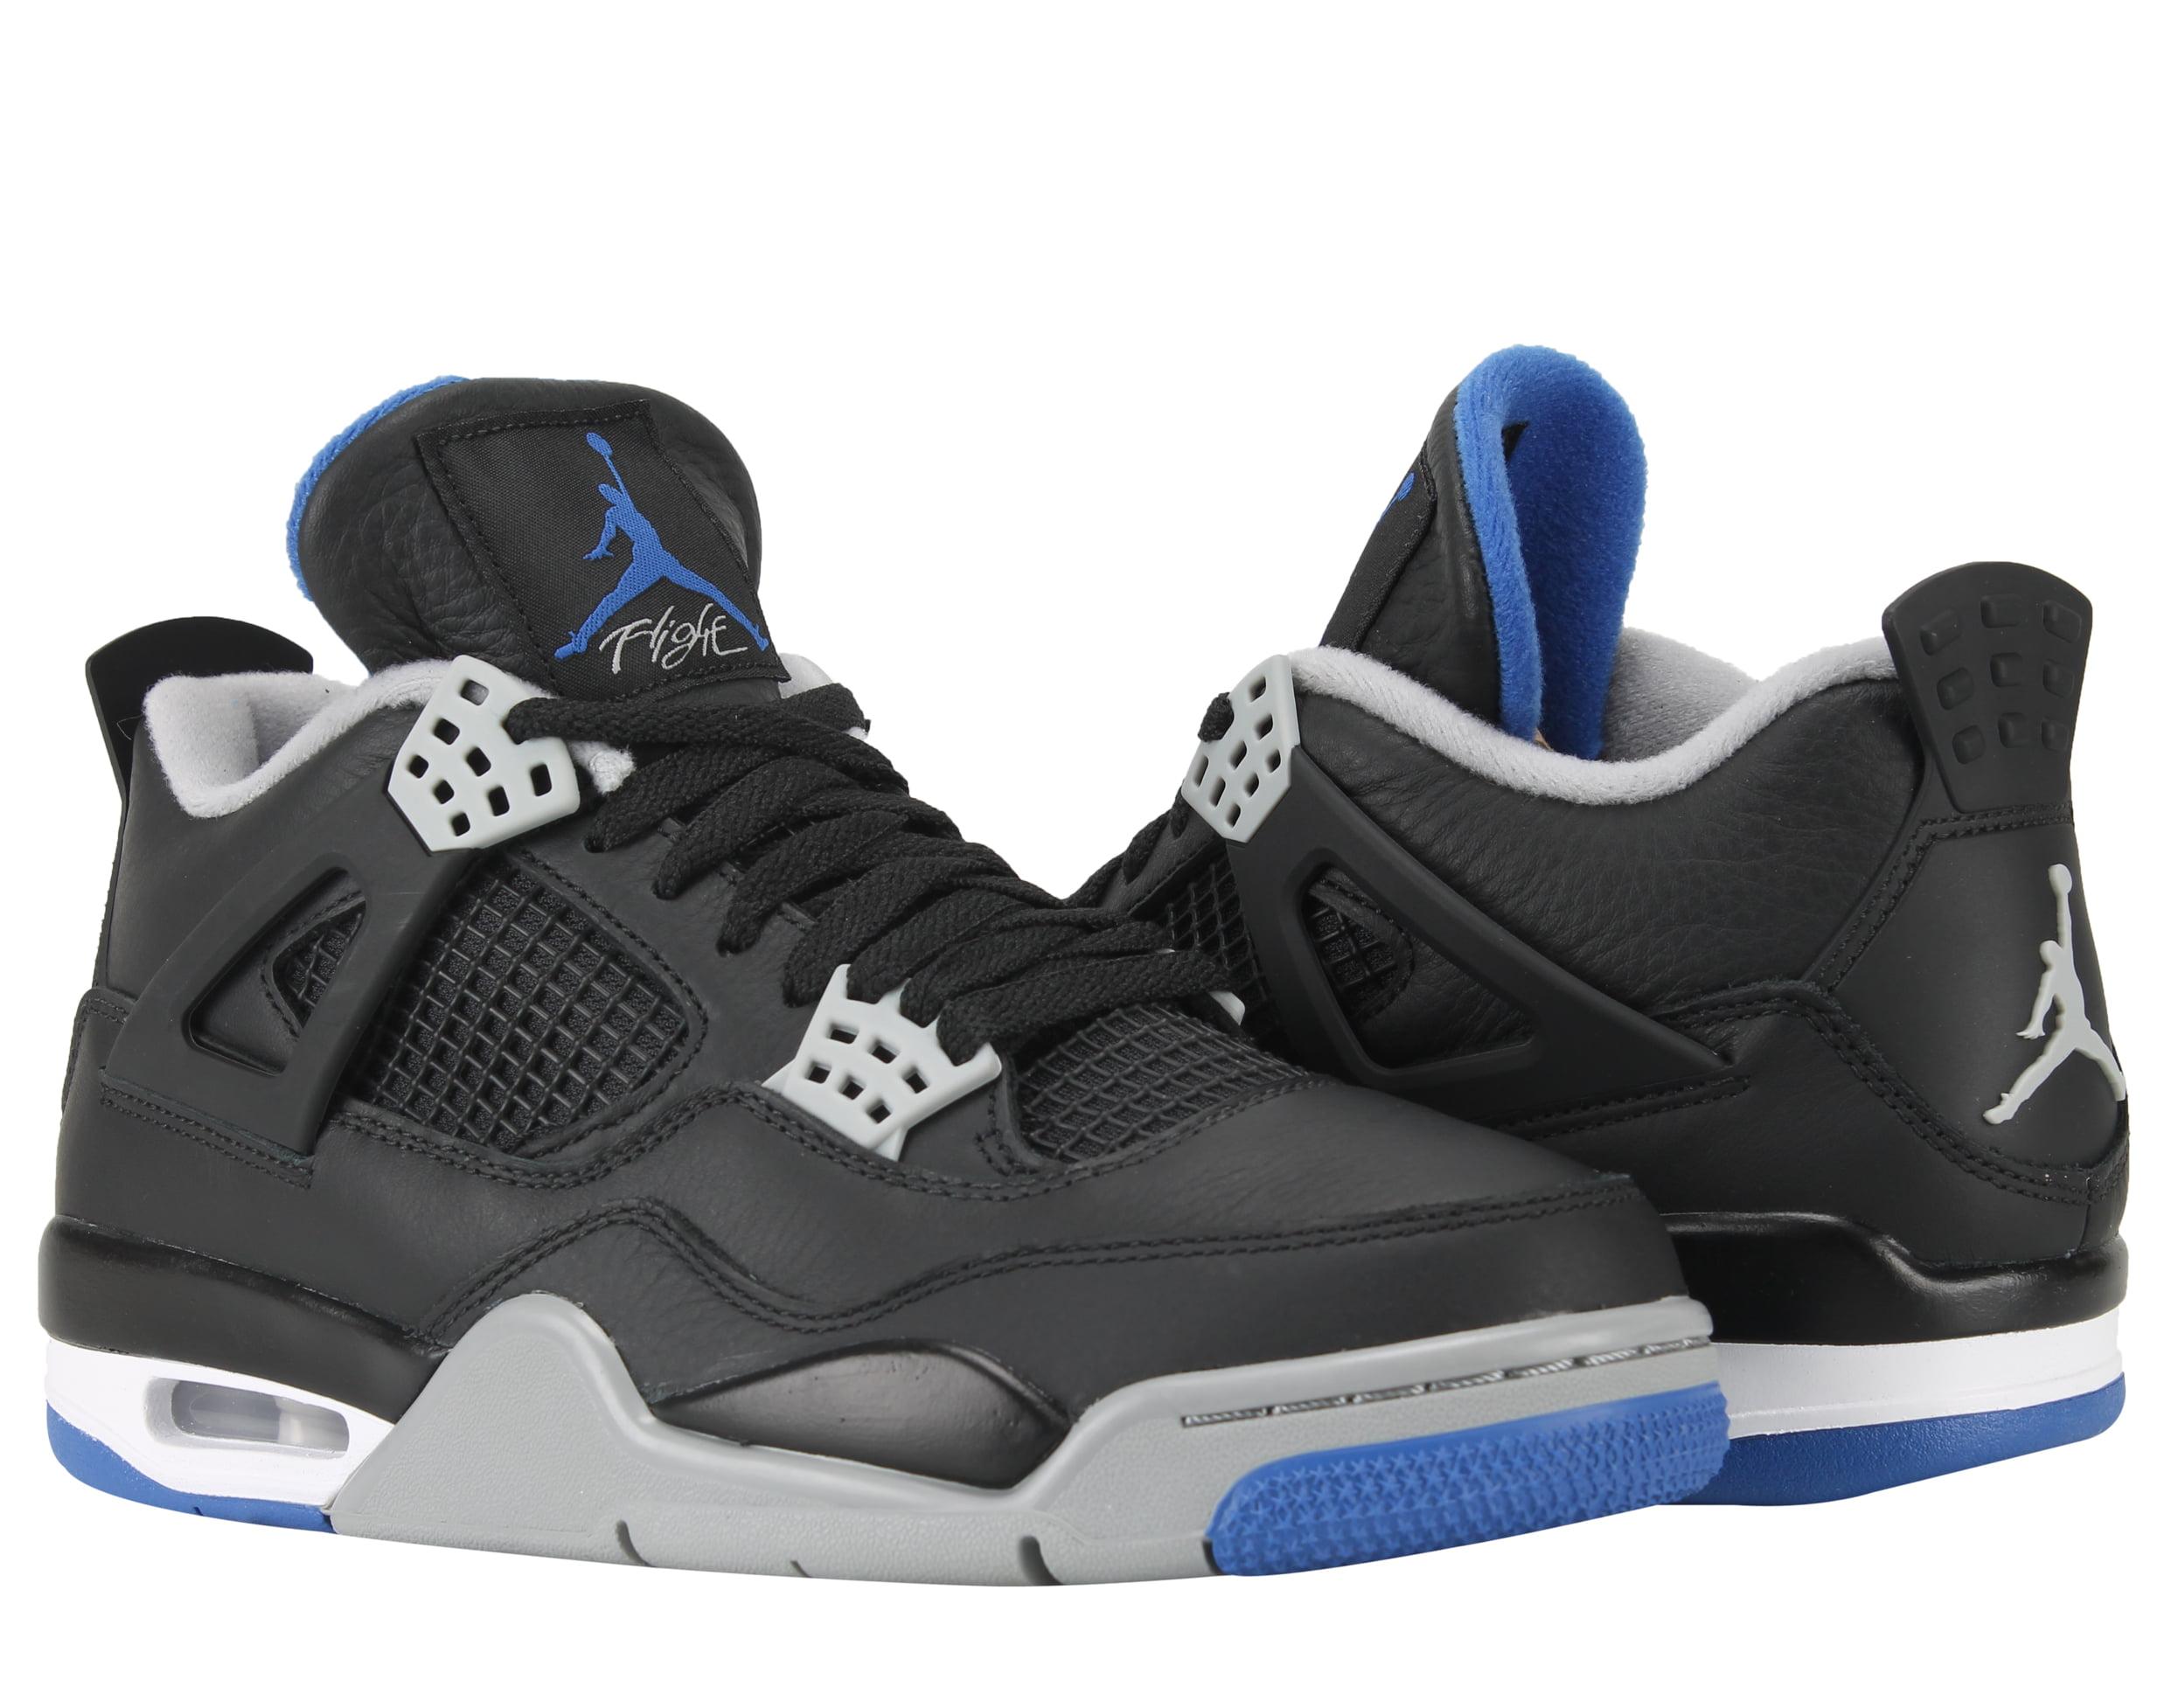 new arrivals 0aea7 35c51 ... discount nike air jordan 4 retro motorsports black mens basketball shoes  308497 006 3b33f 3ef22